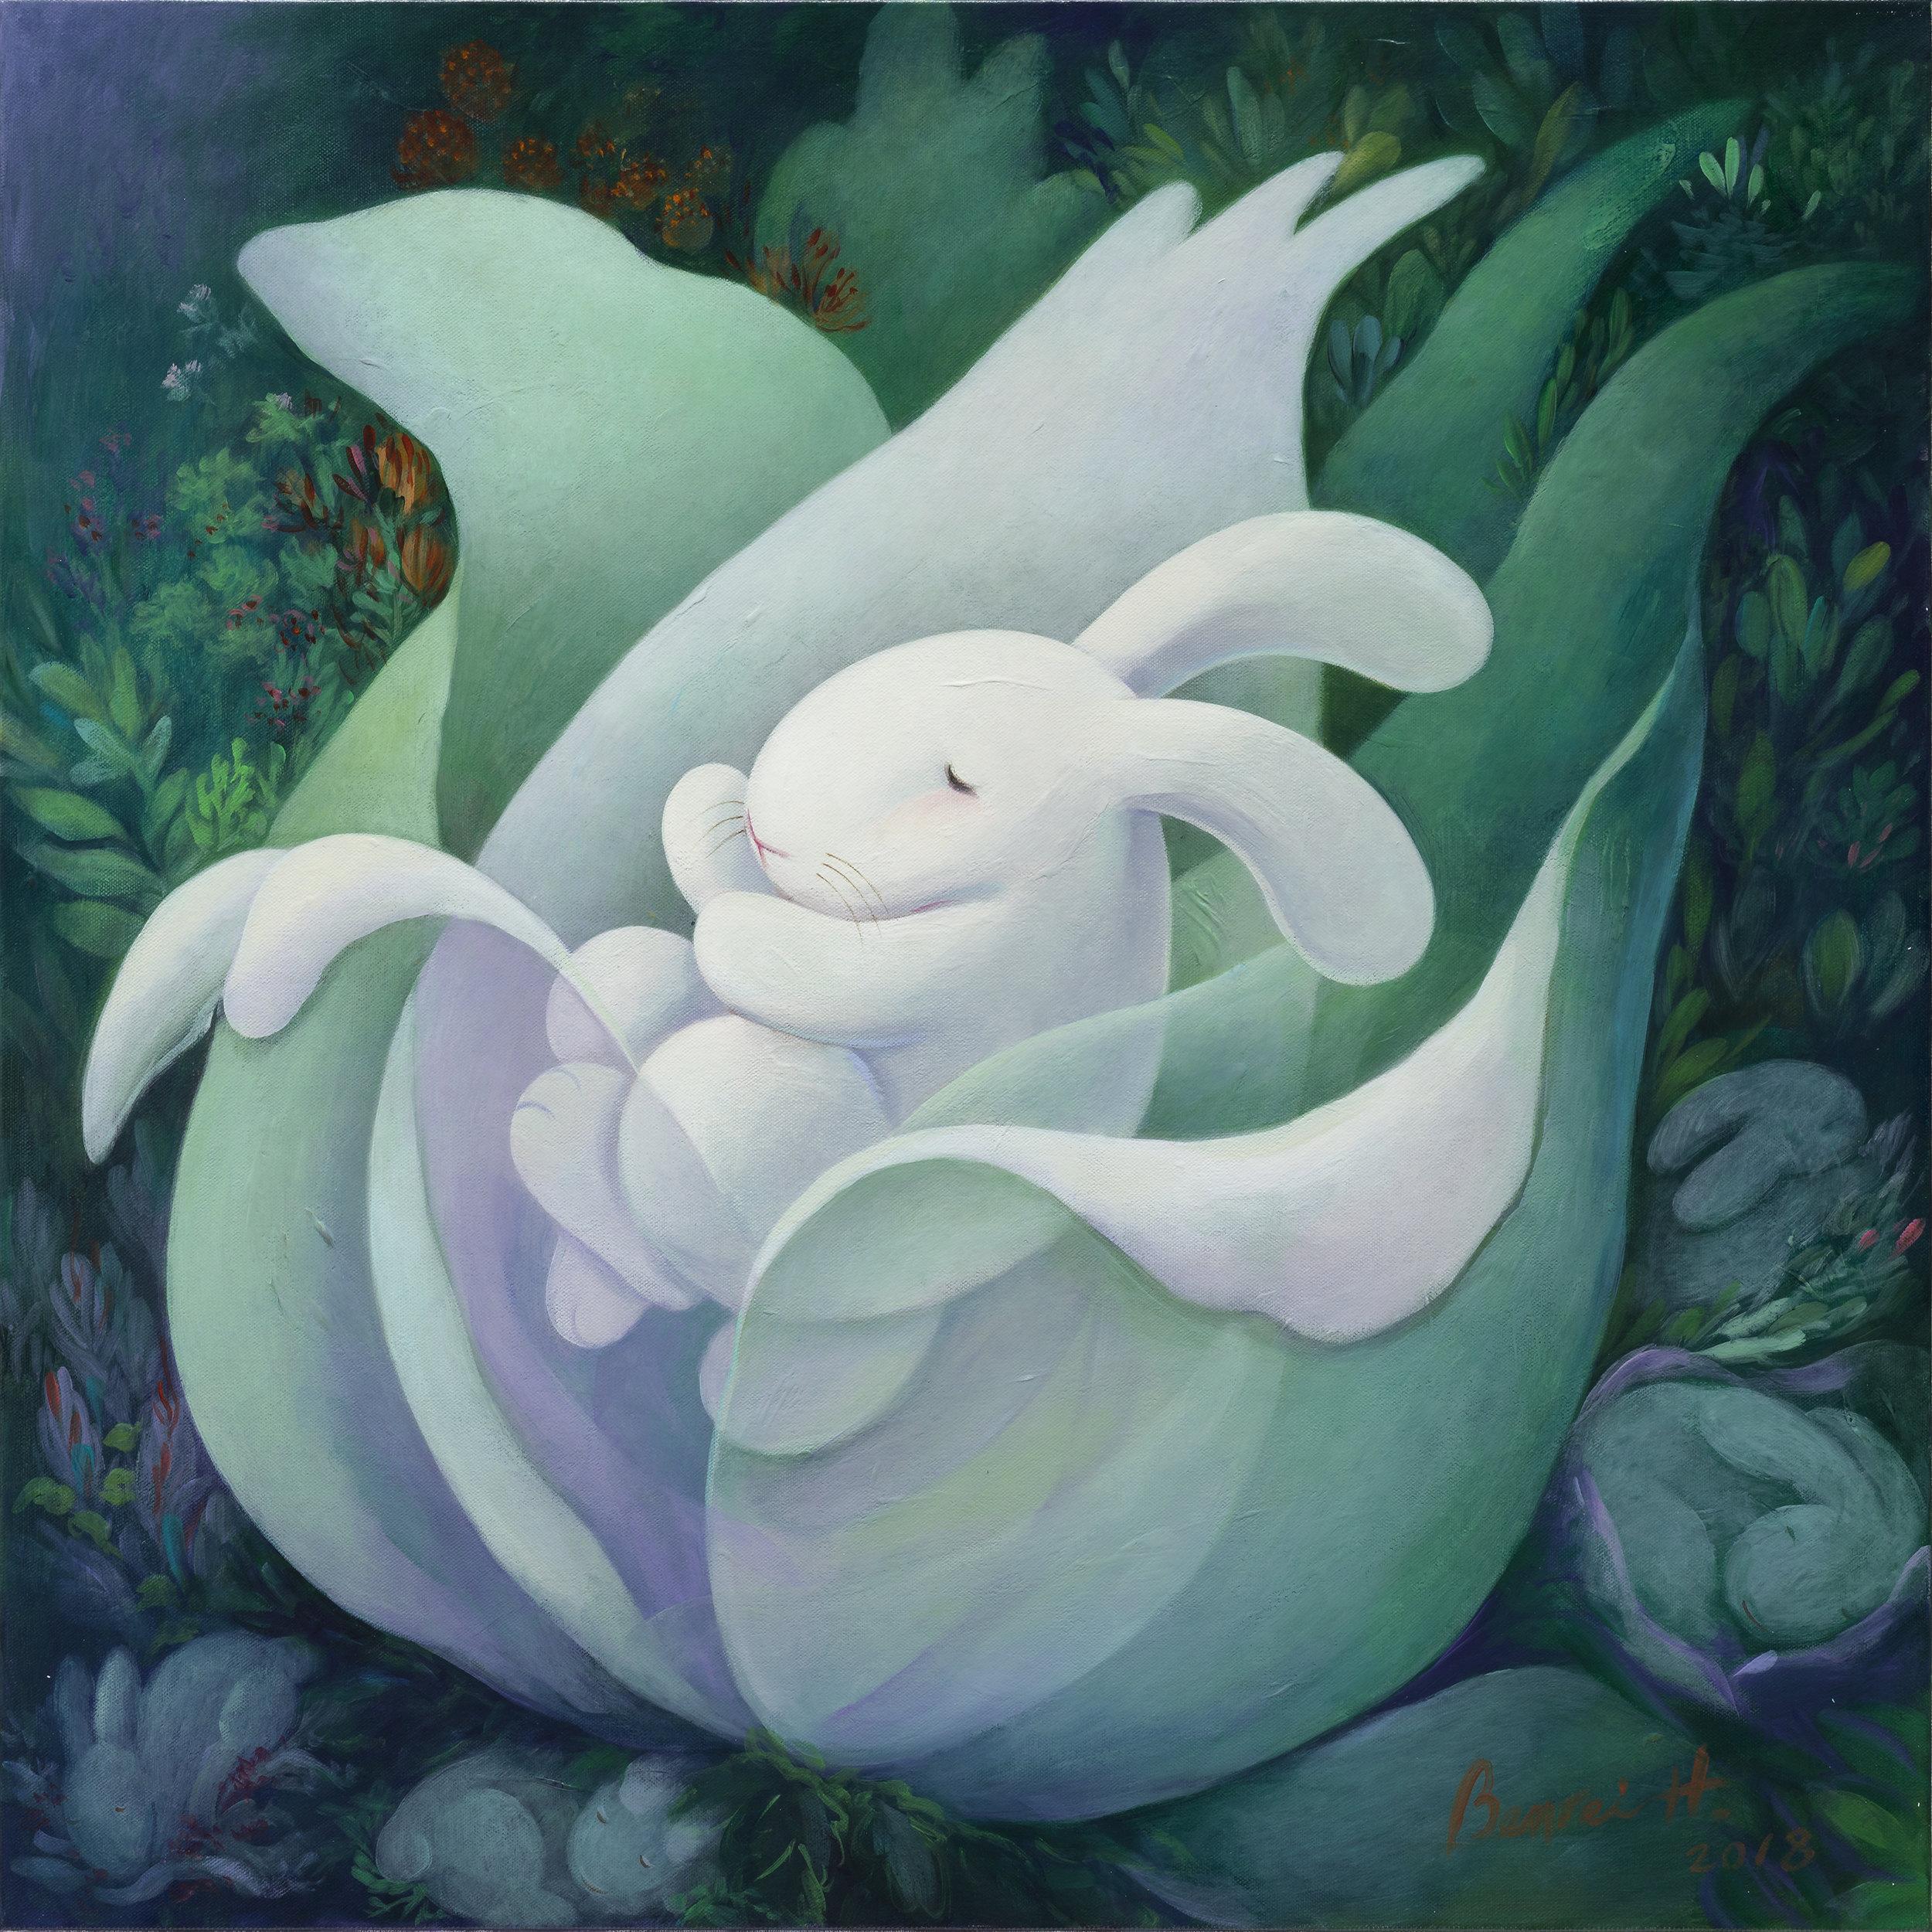 "Flower babies 花之寶,30x30""(76x76cm), acrylic on canvas, 2018"